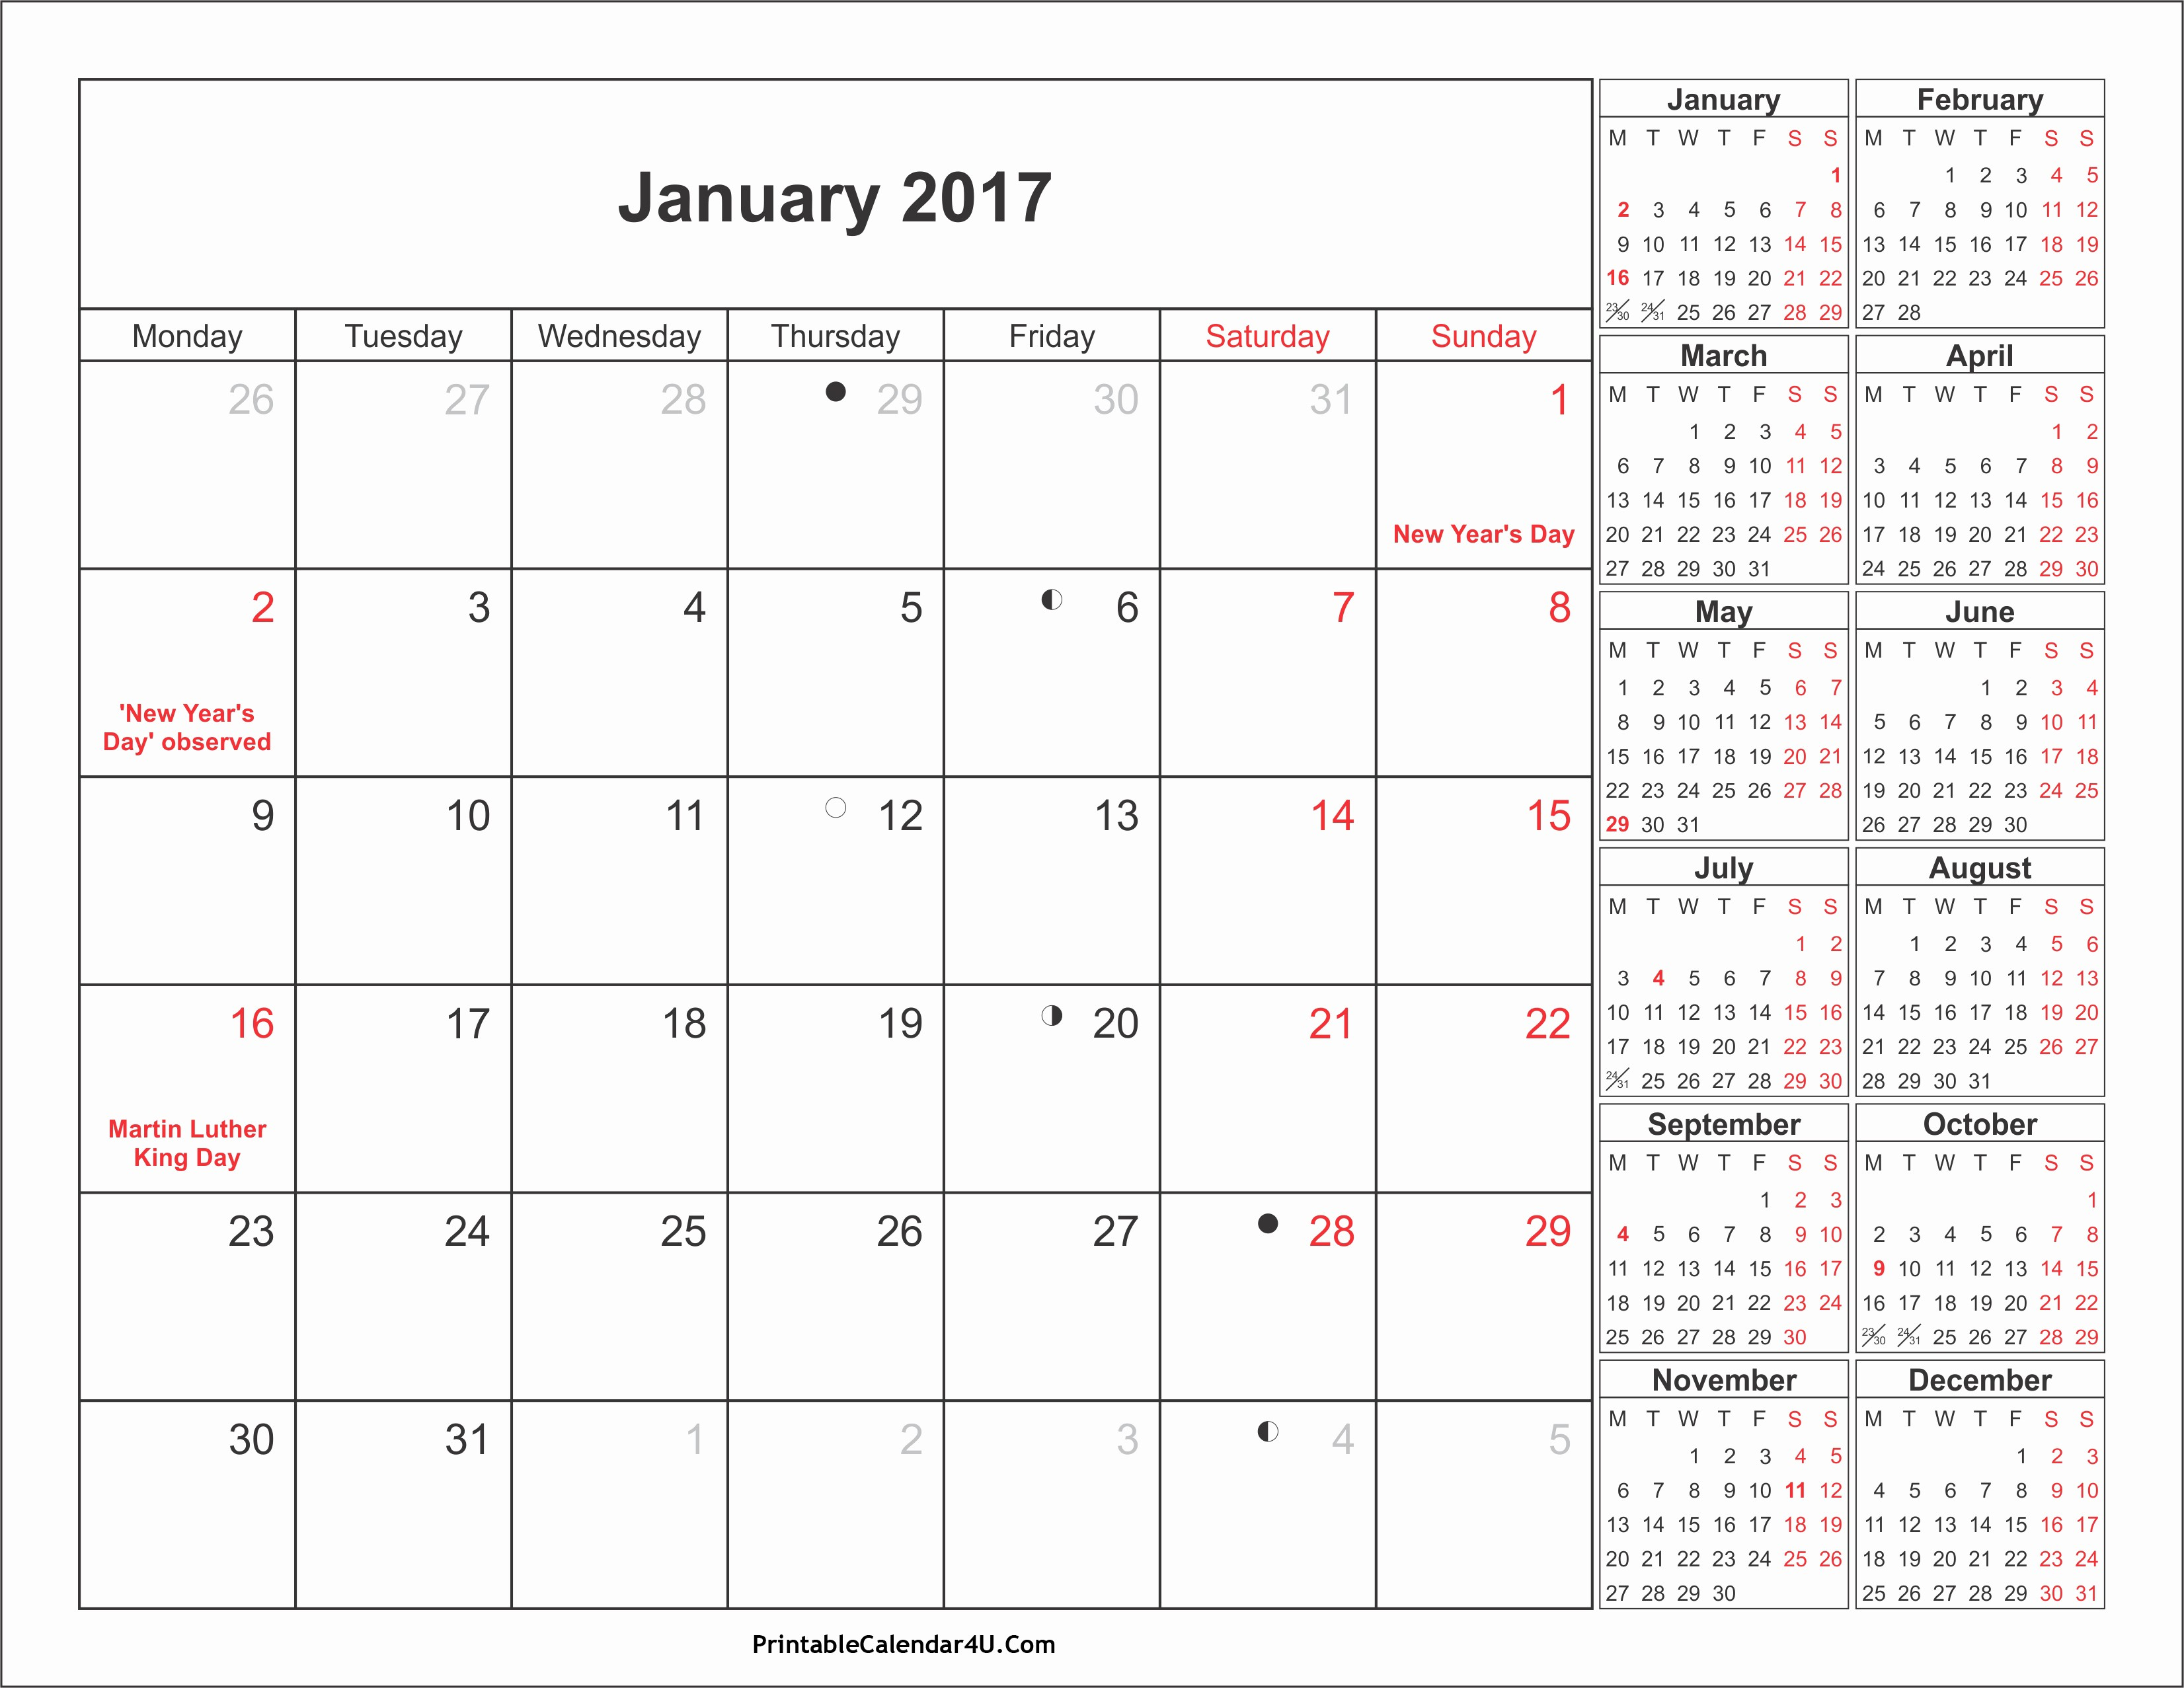 2017 Calendar Template Word Document Luxury September 2017 Calendar Word